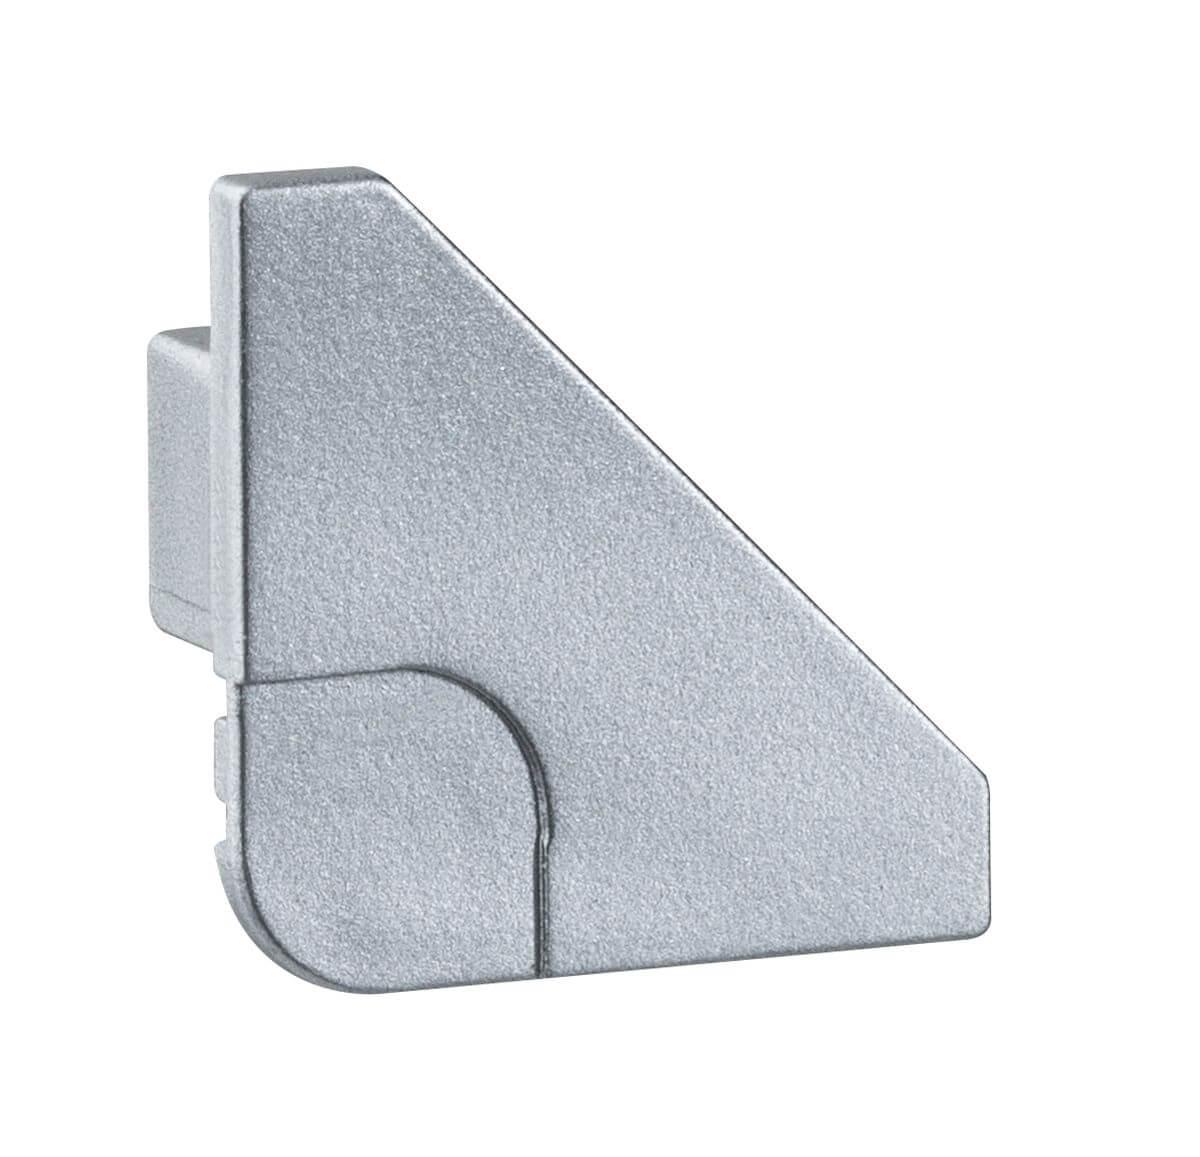 PaulmannDelta Profil Cap, 2er Pack, Alu matt, Kunststoff